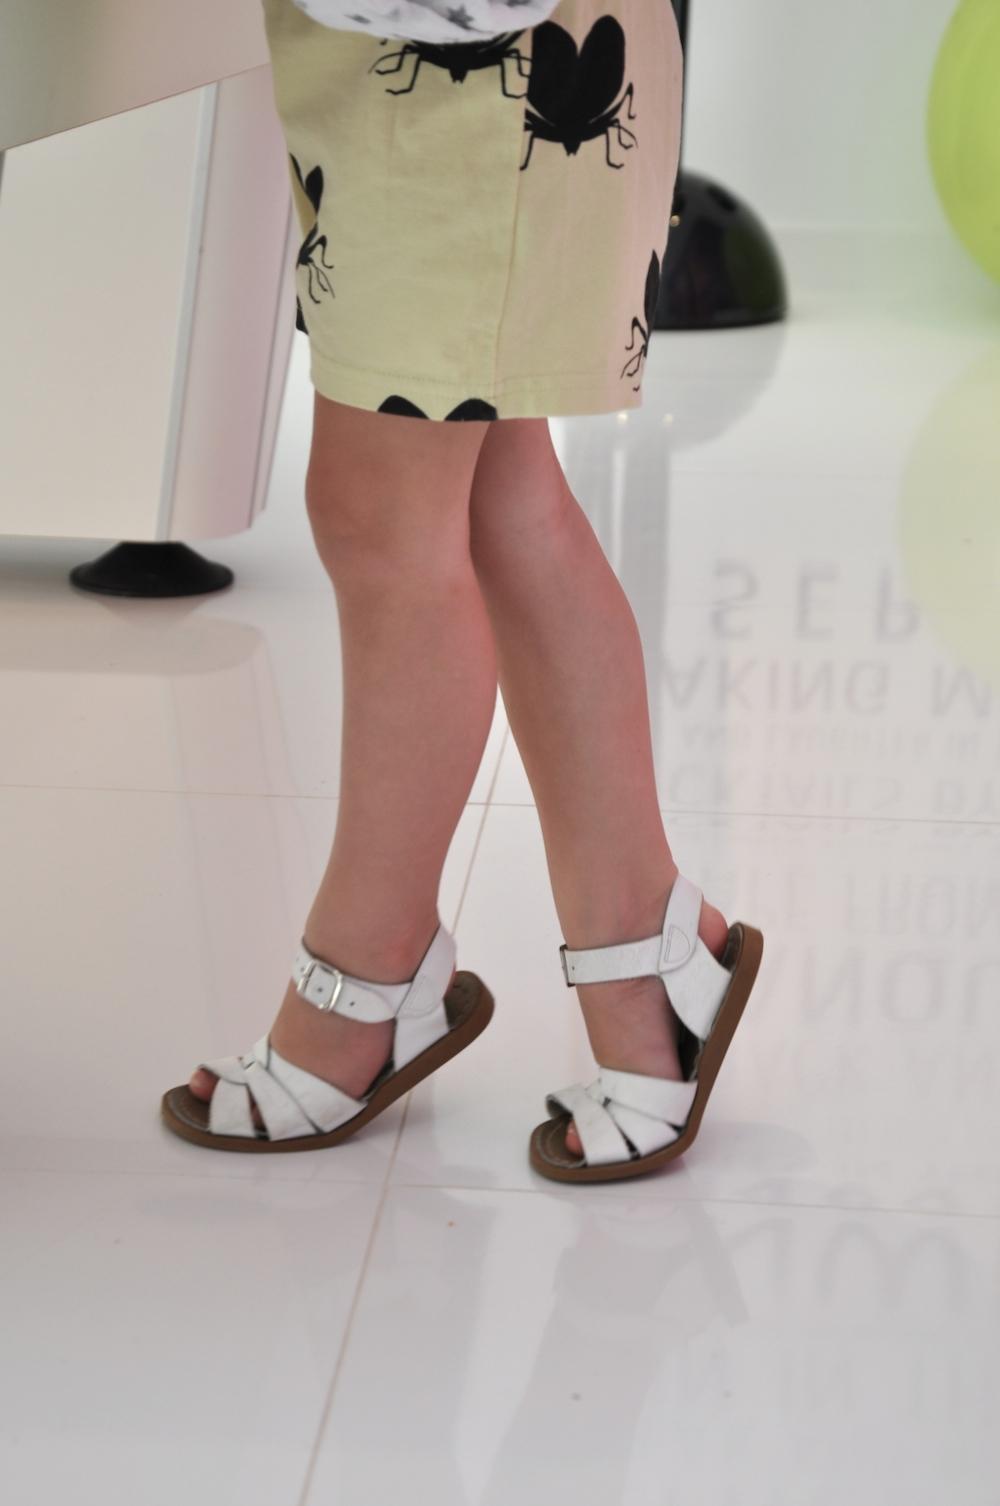 saltwater_sun_san_sandals_beau_loves